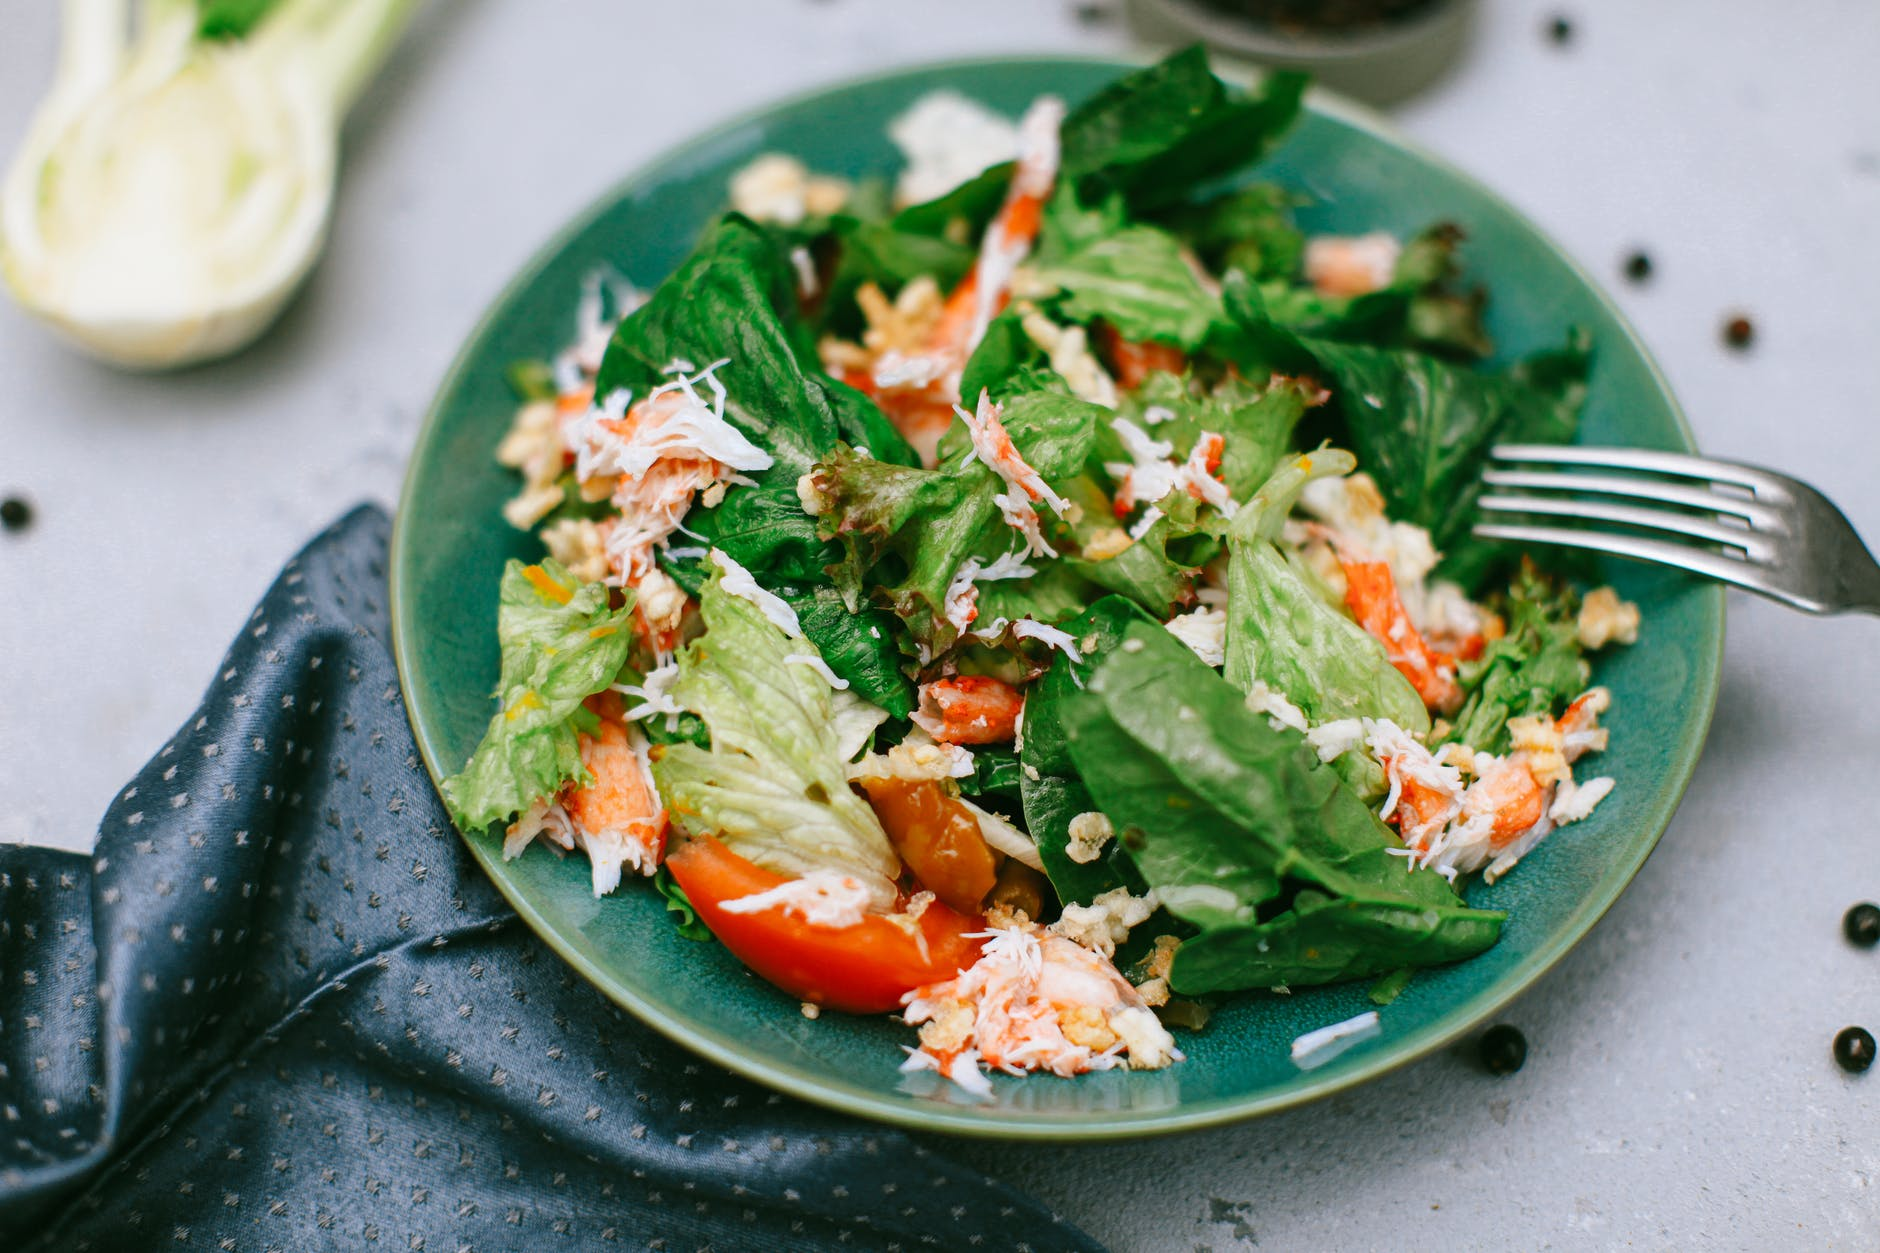 Best Salad Montreal | Meilleur Salade Montreal | Chloesalad